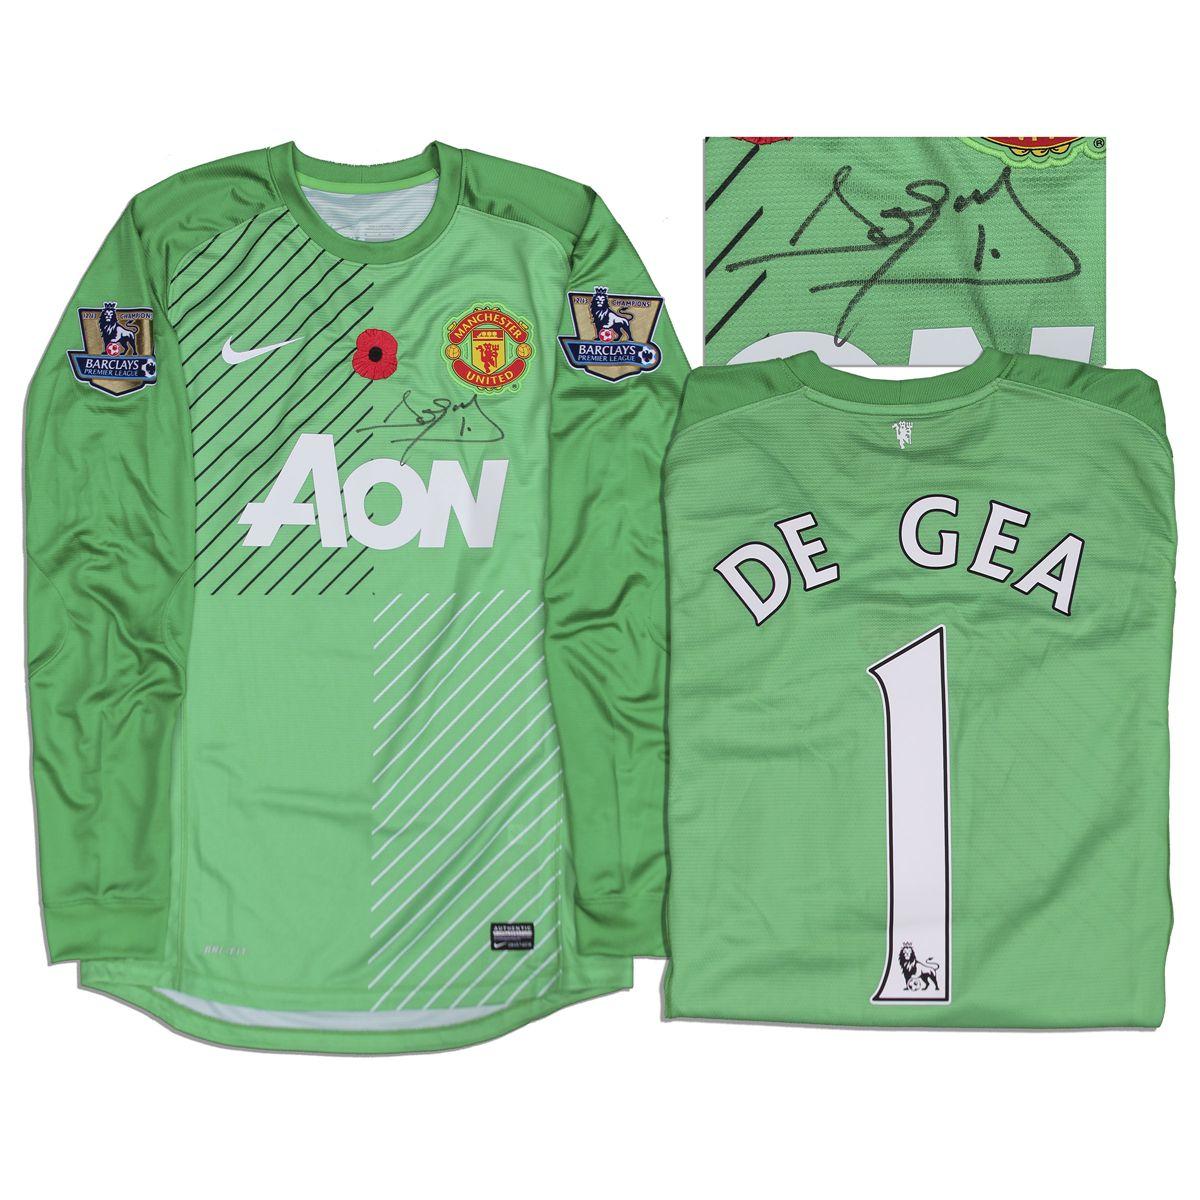 brand new 7c2a2 27f0b David DeGea Match Worn Manchester United Shirt Signed